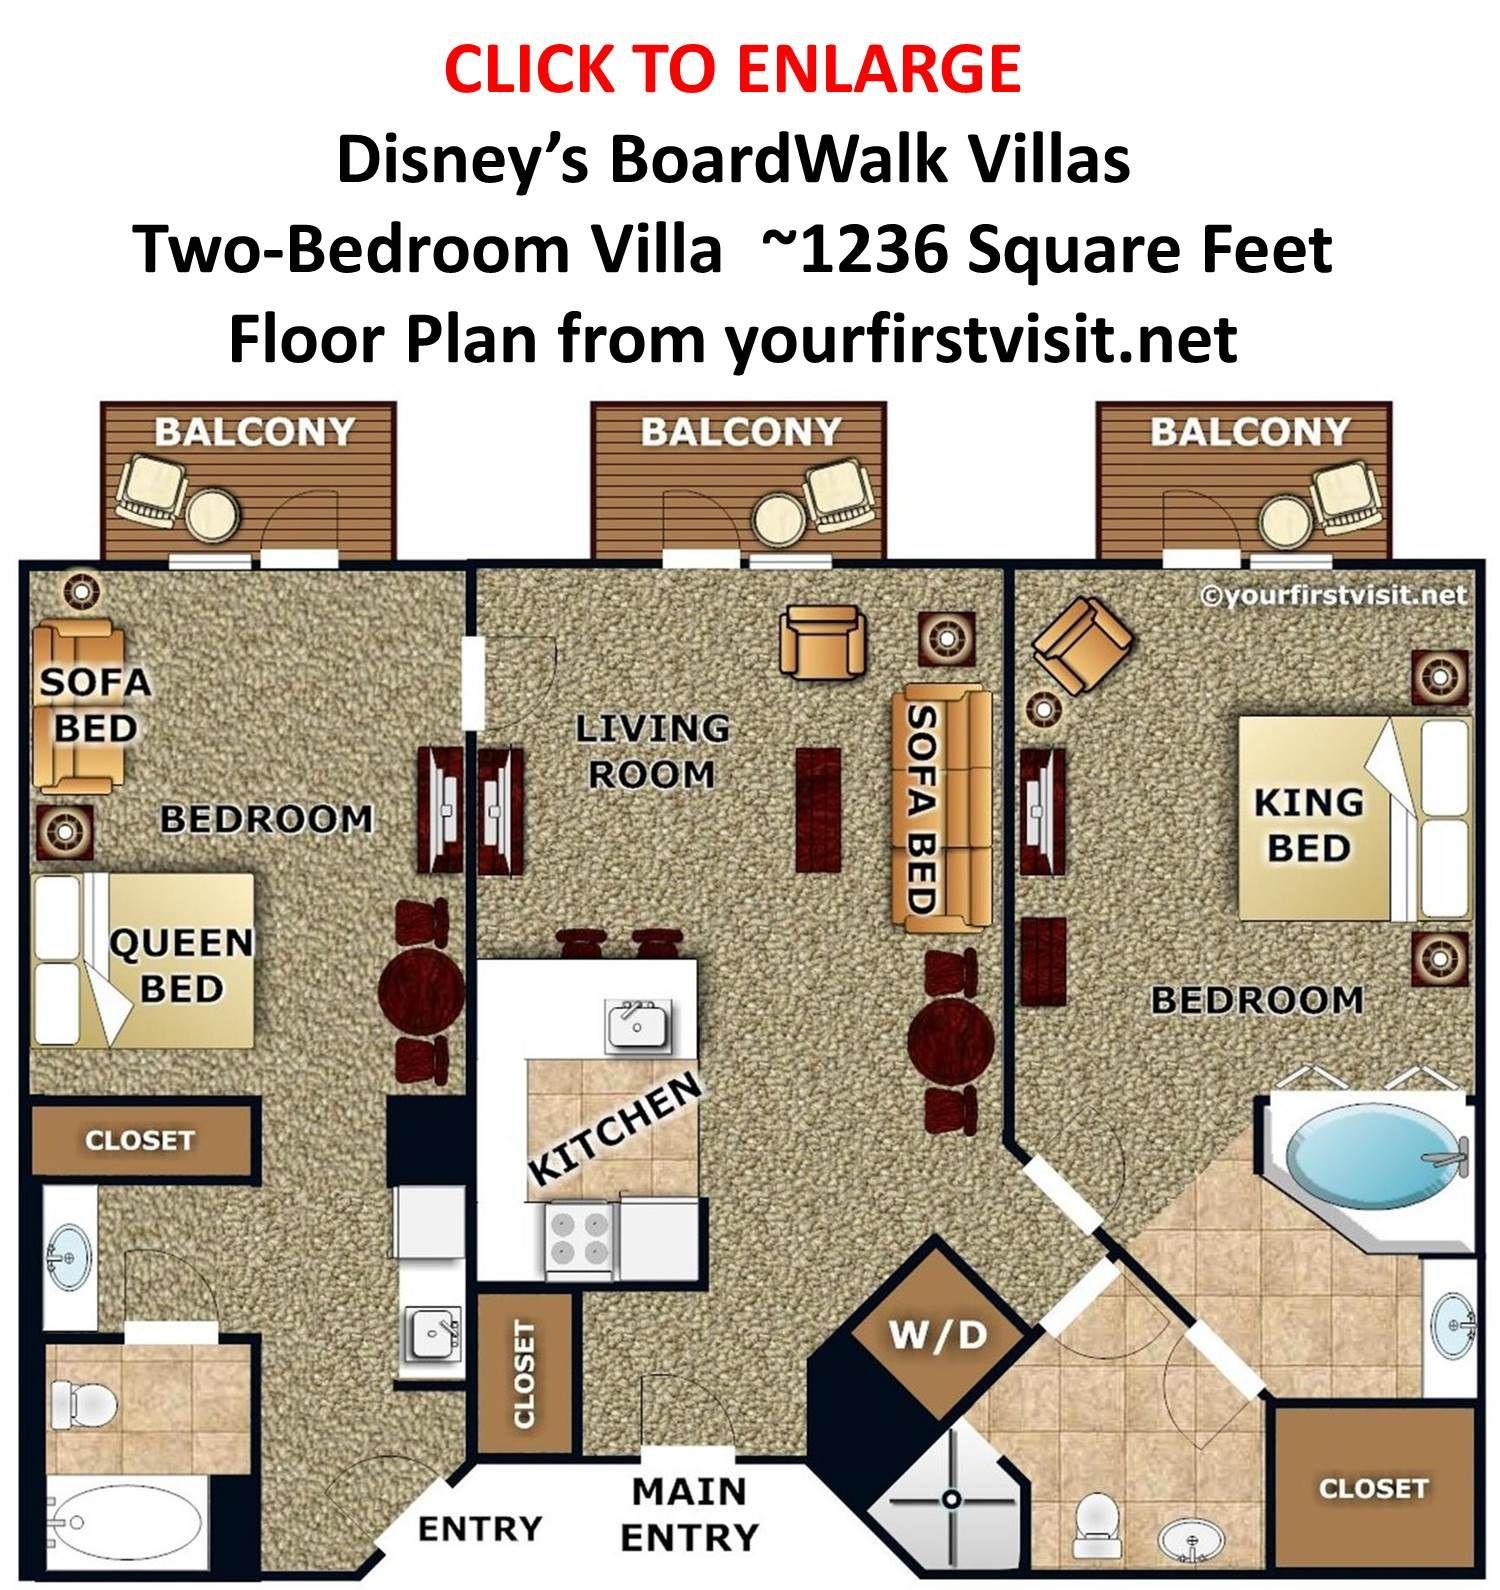 Saratoga Springs Treehouse Villas Floor Plan Saratoga Springs 2 Bedroom Villa Floor Plan